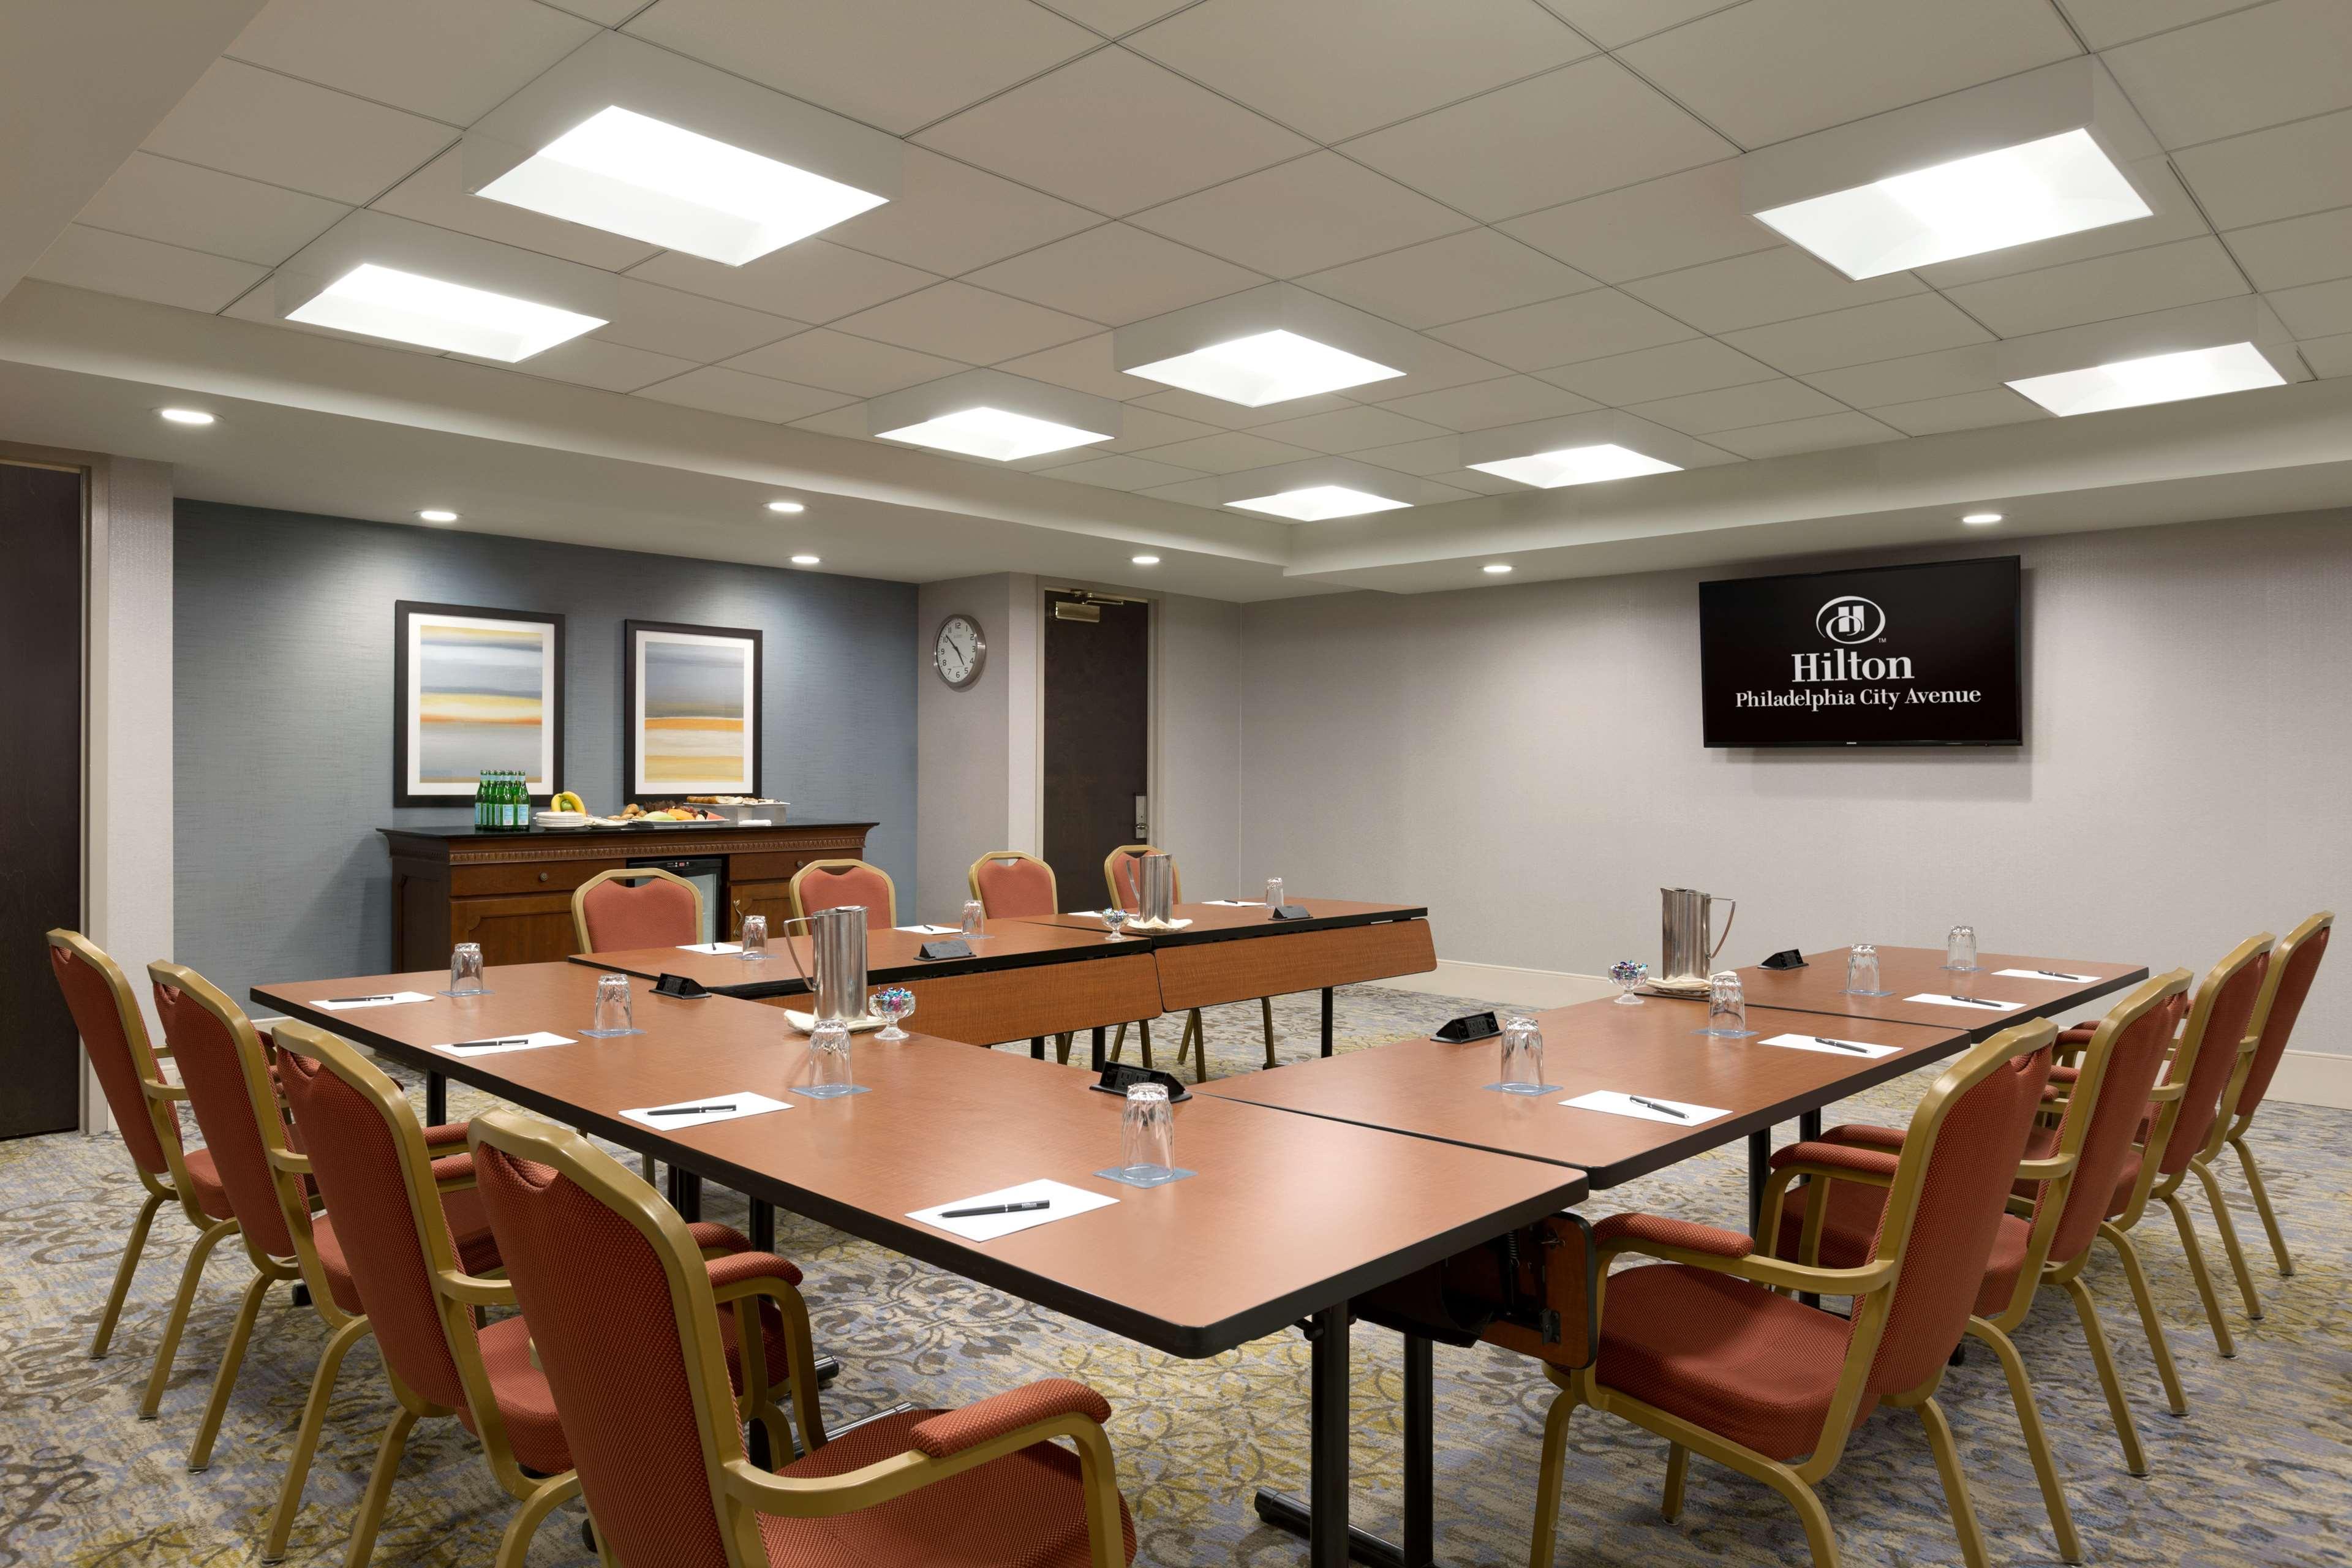 Hilton Philadelphia City Avenue image 27